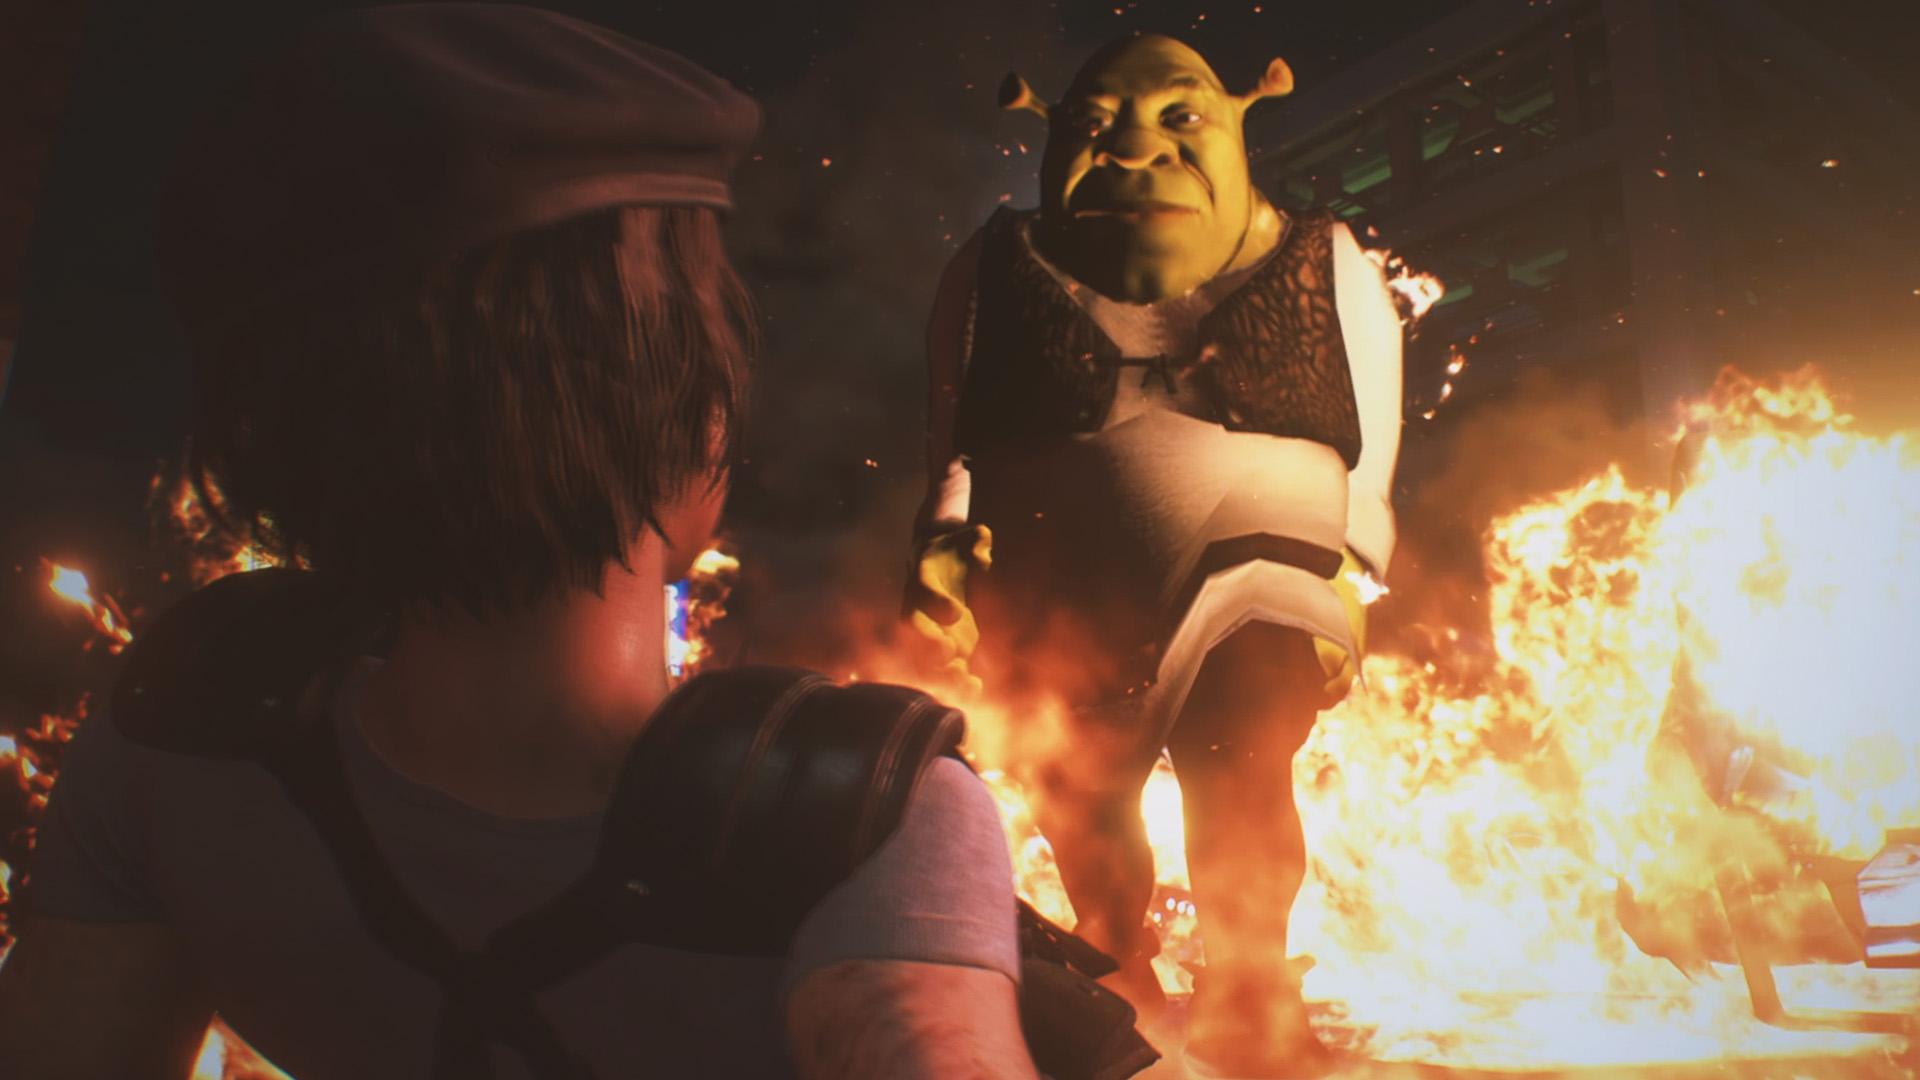 Resident Evil 3 Remake A Mod Transforms Nemesis Into Shrek Let S